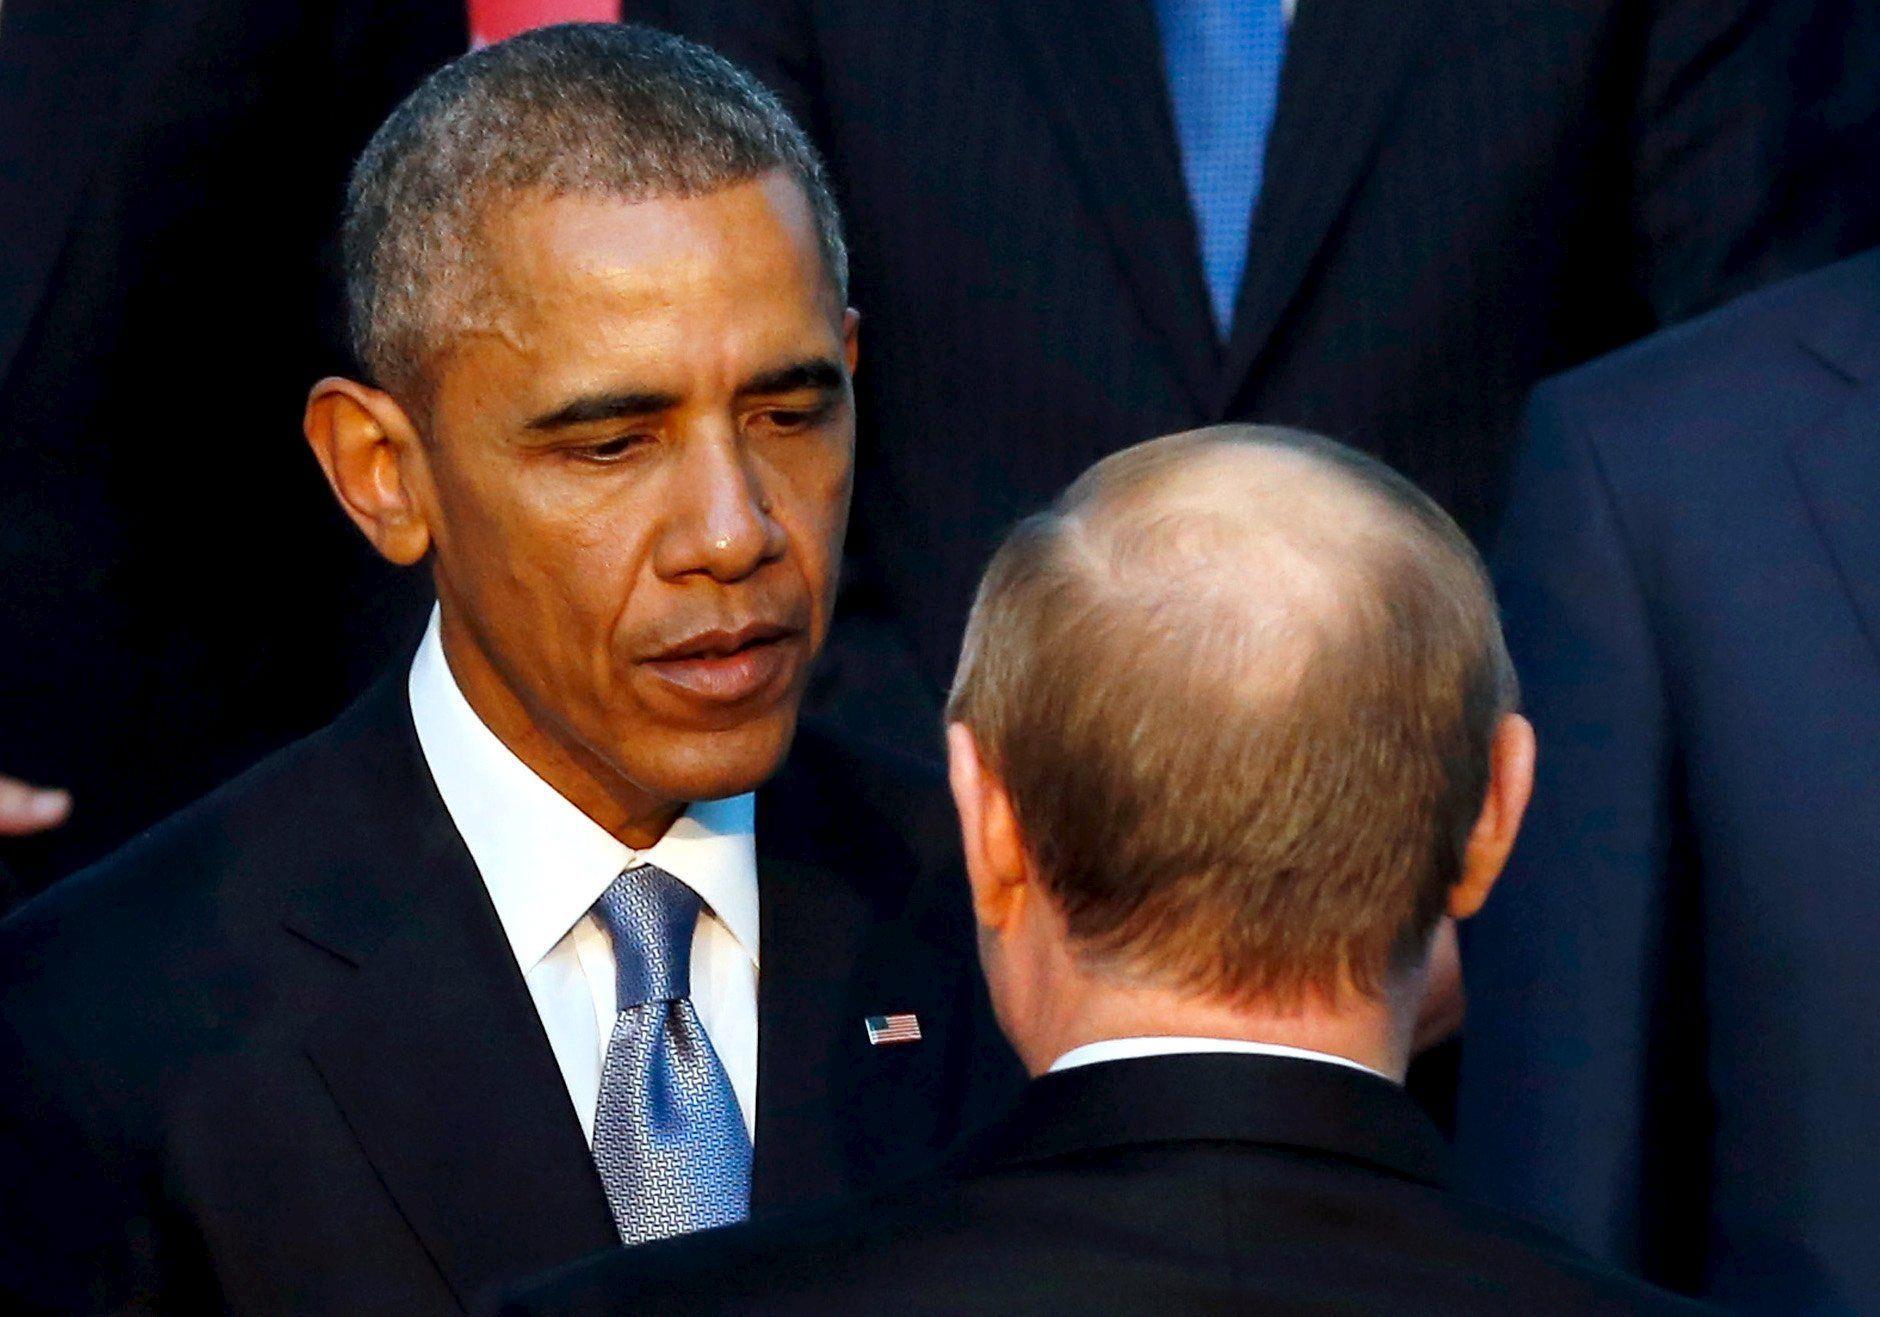 Обама знал о причастности РФ к катастрофе Boeing MH17